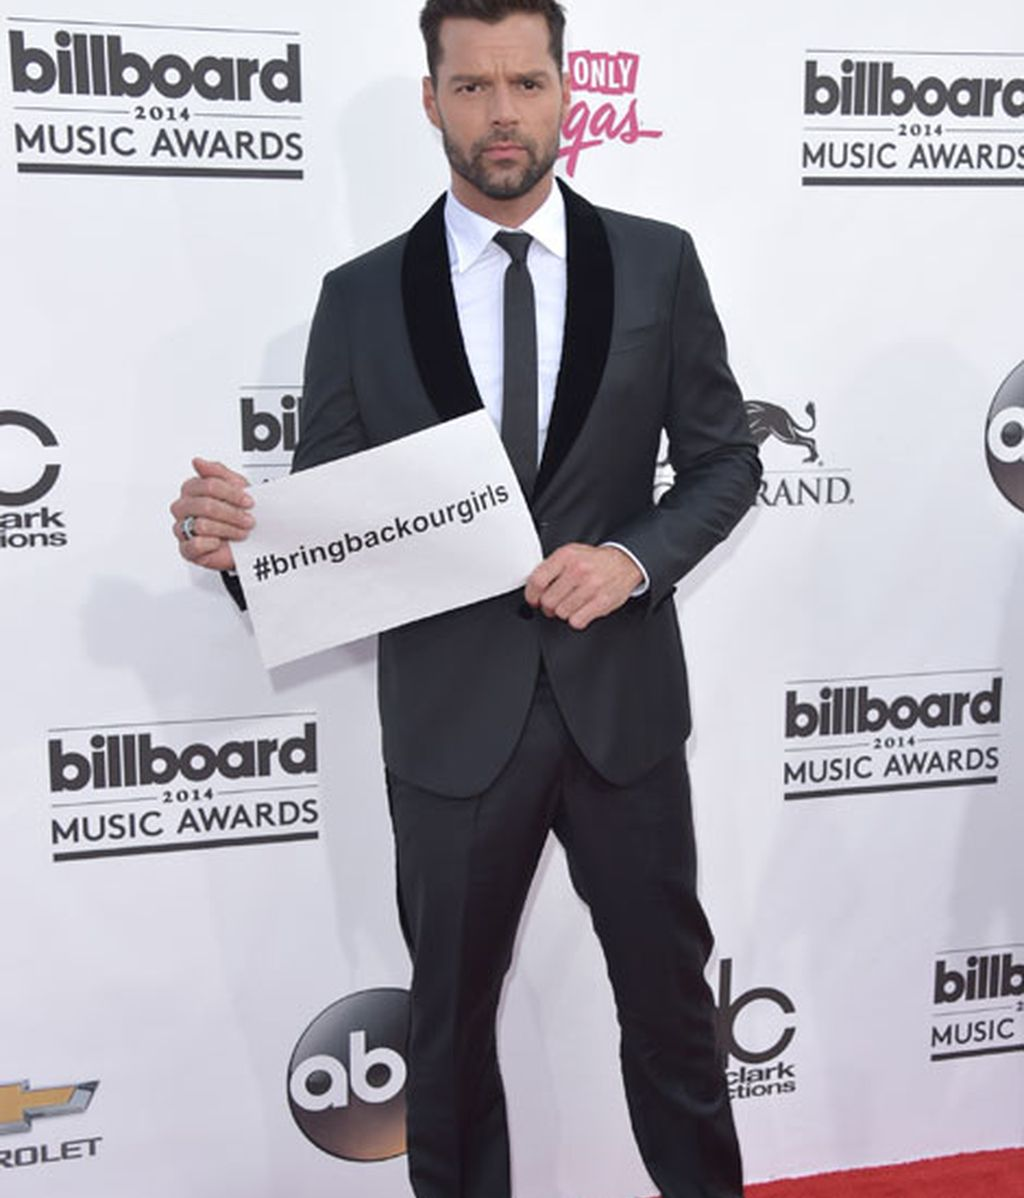 Ricky Martin reivindicativo en la alfombra roja